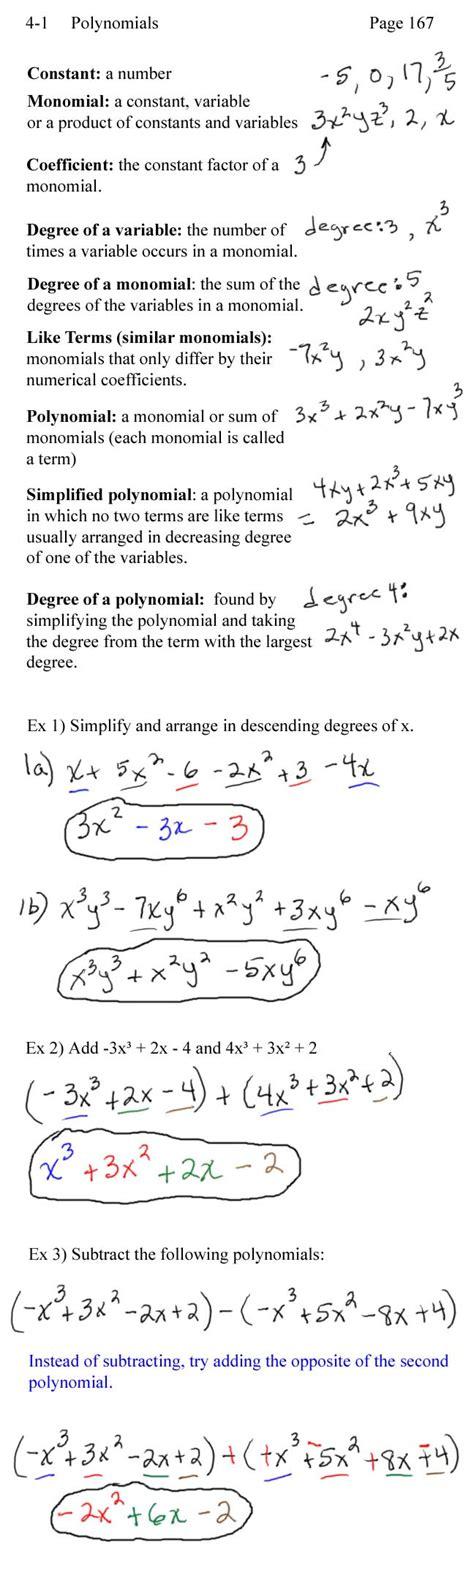 Polynomial Word Problems Worksheet by Multiplying Polynomials Word Problems Doc Algebra